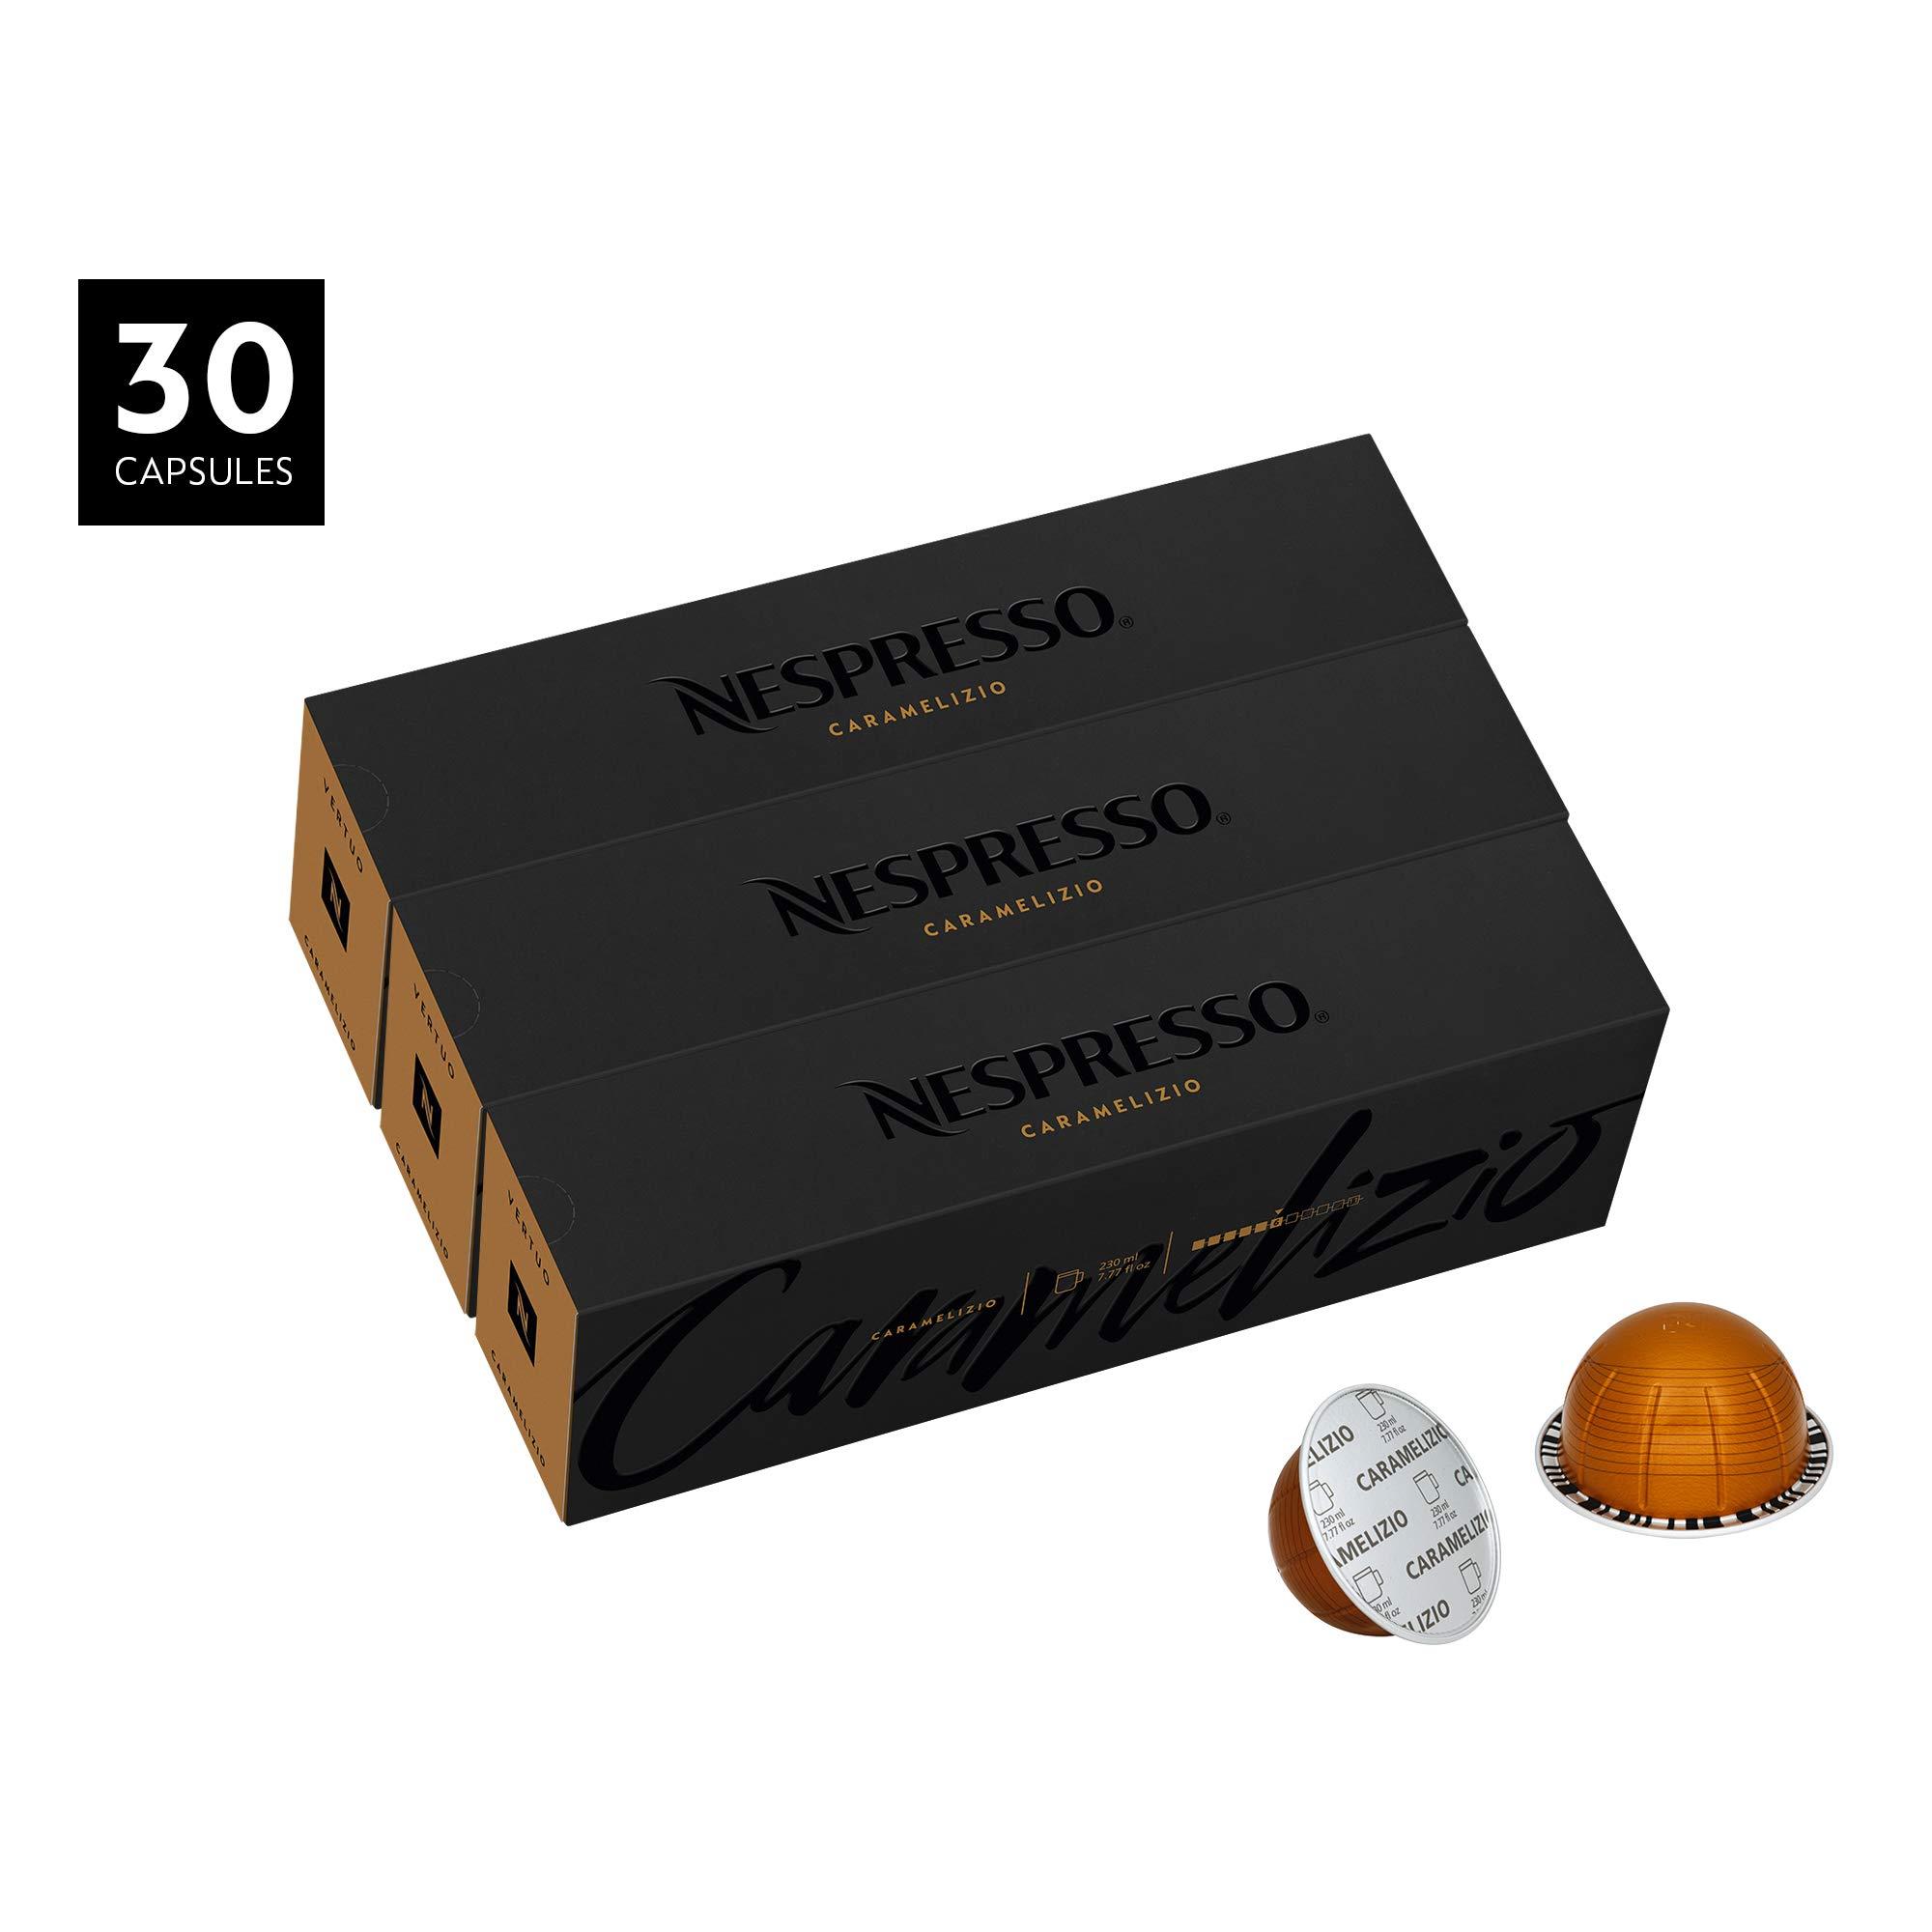 Nespresso VertuoLine Coffee, Caramelizio, 30 Capsules by Nespresso